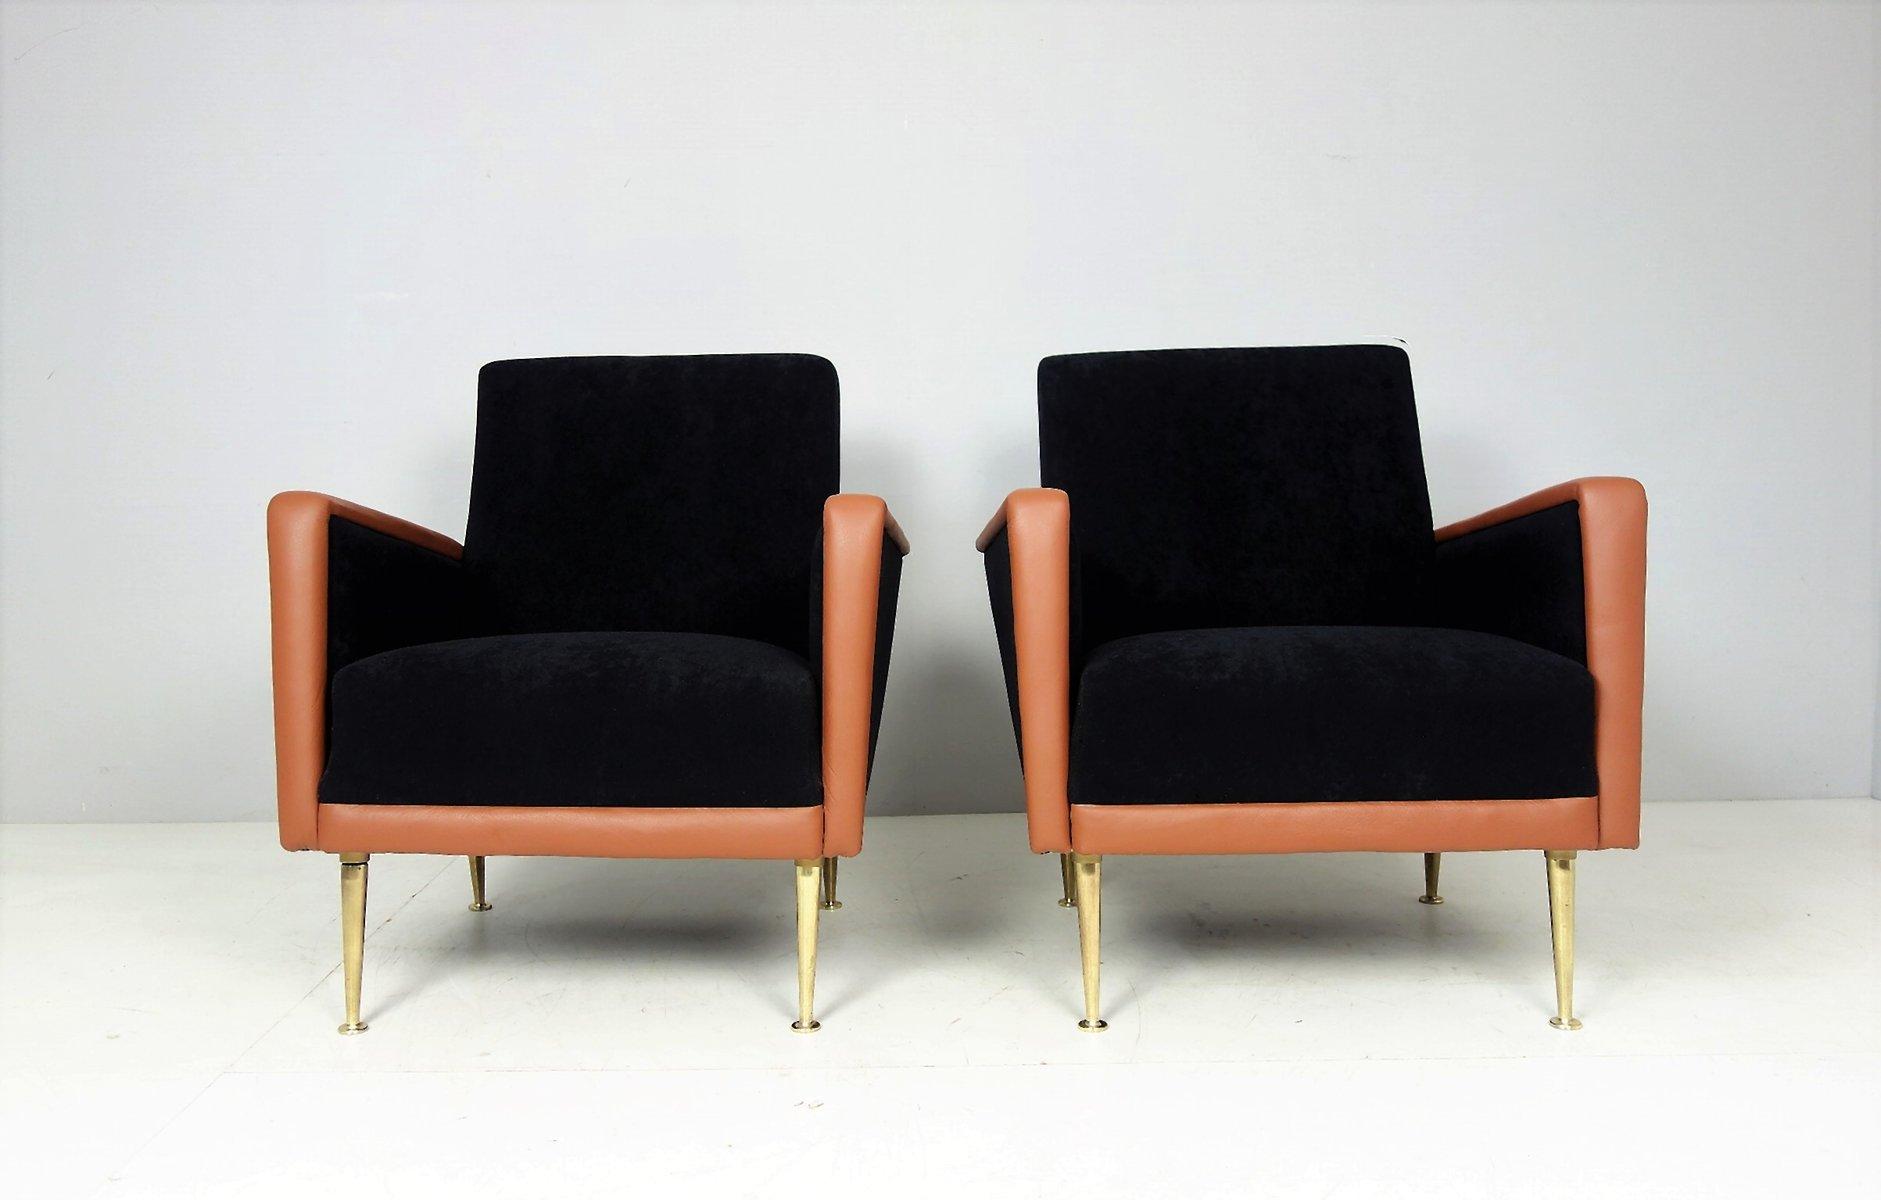 Italienische vintage sessel aus leder stoff 2er set bei for Sessel italienisches design